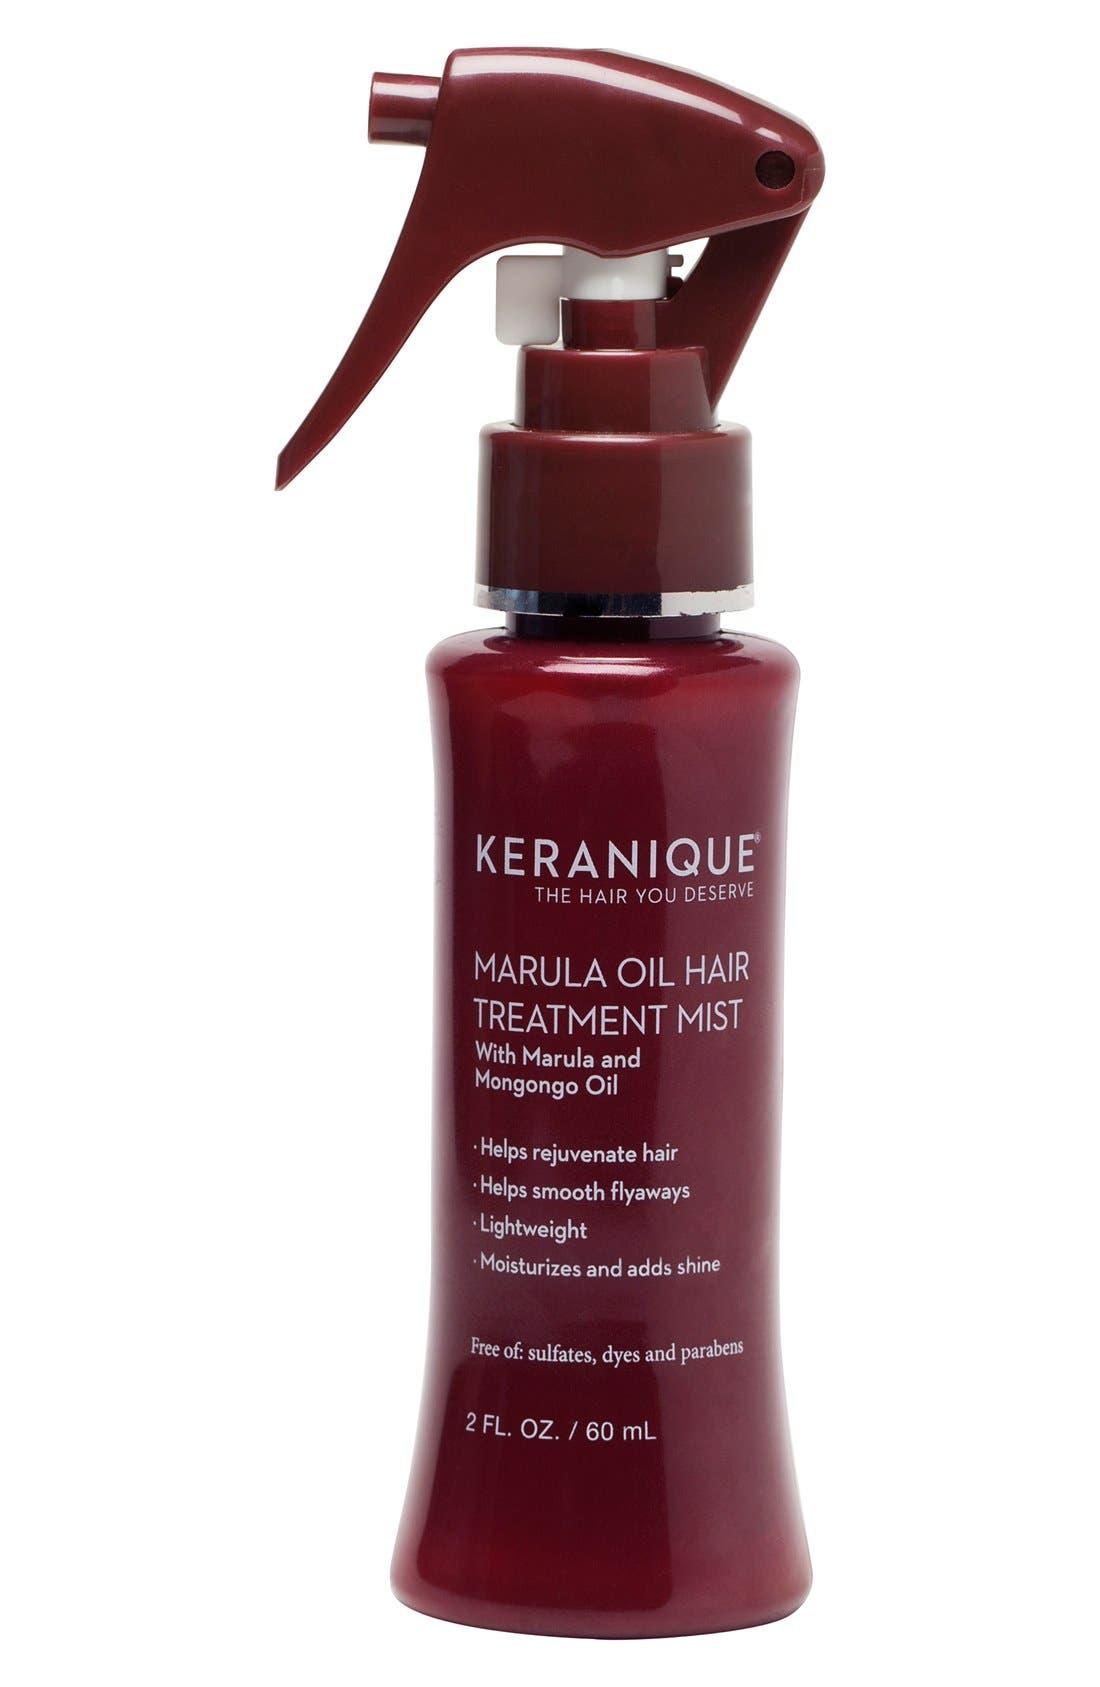 Keranique Marula Oil Hair Treatment Mist